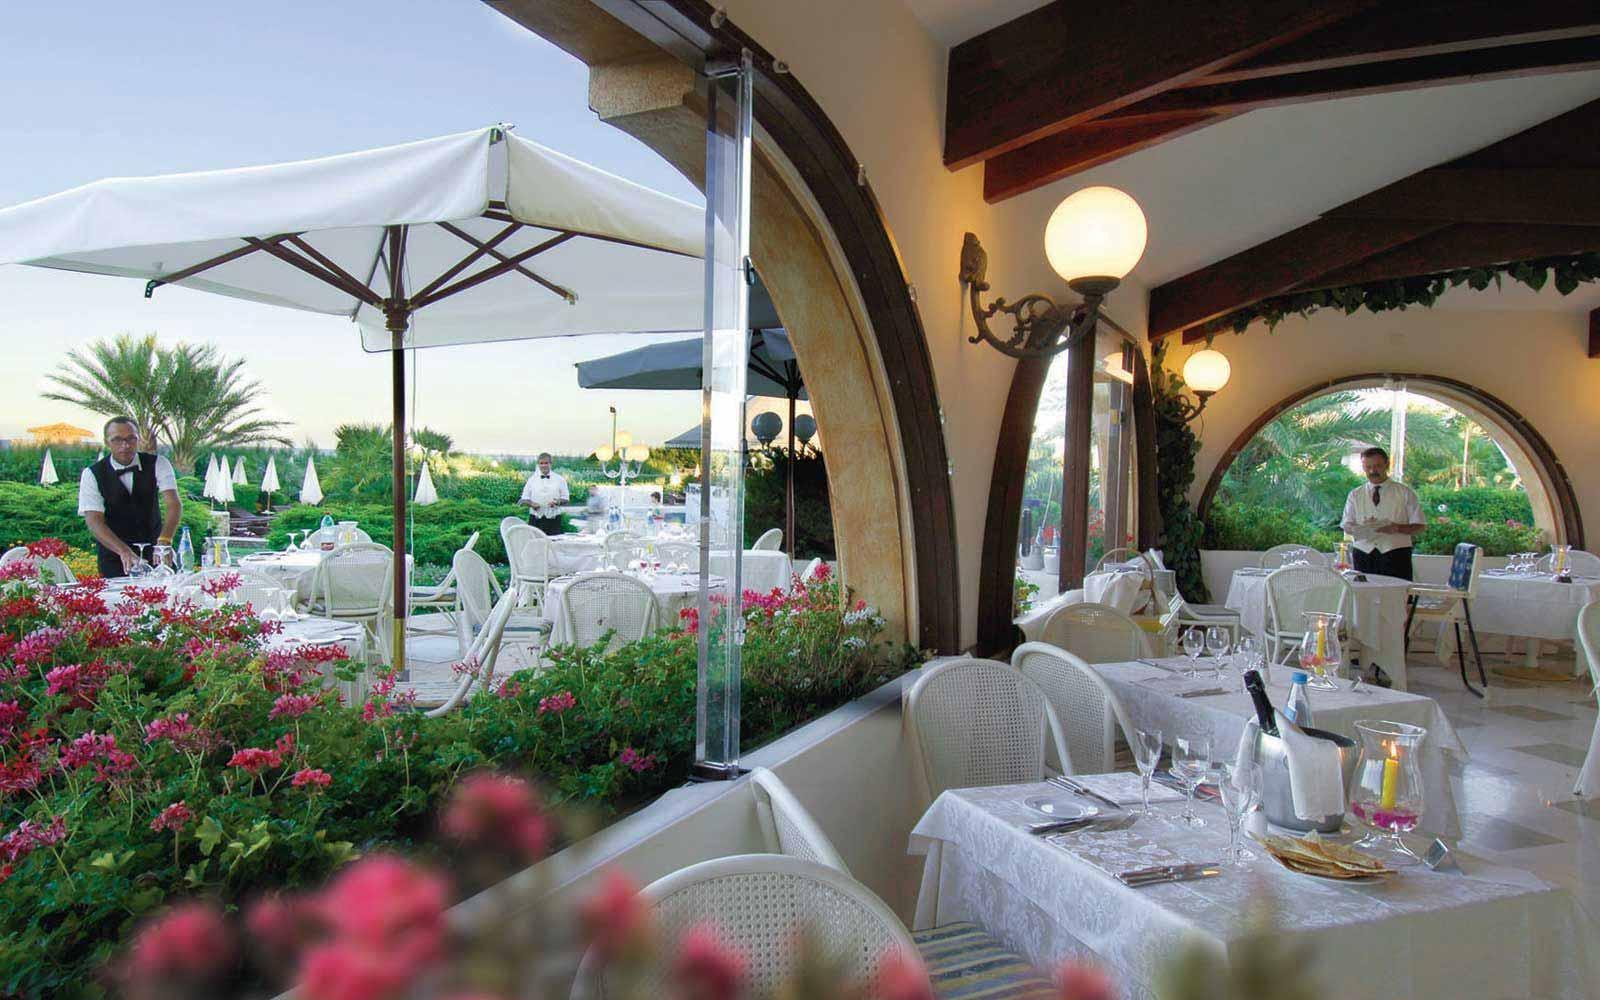 Restaurant at Hotel Baia Di Nora